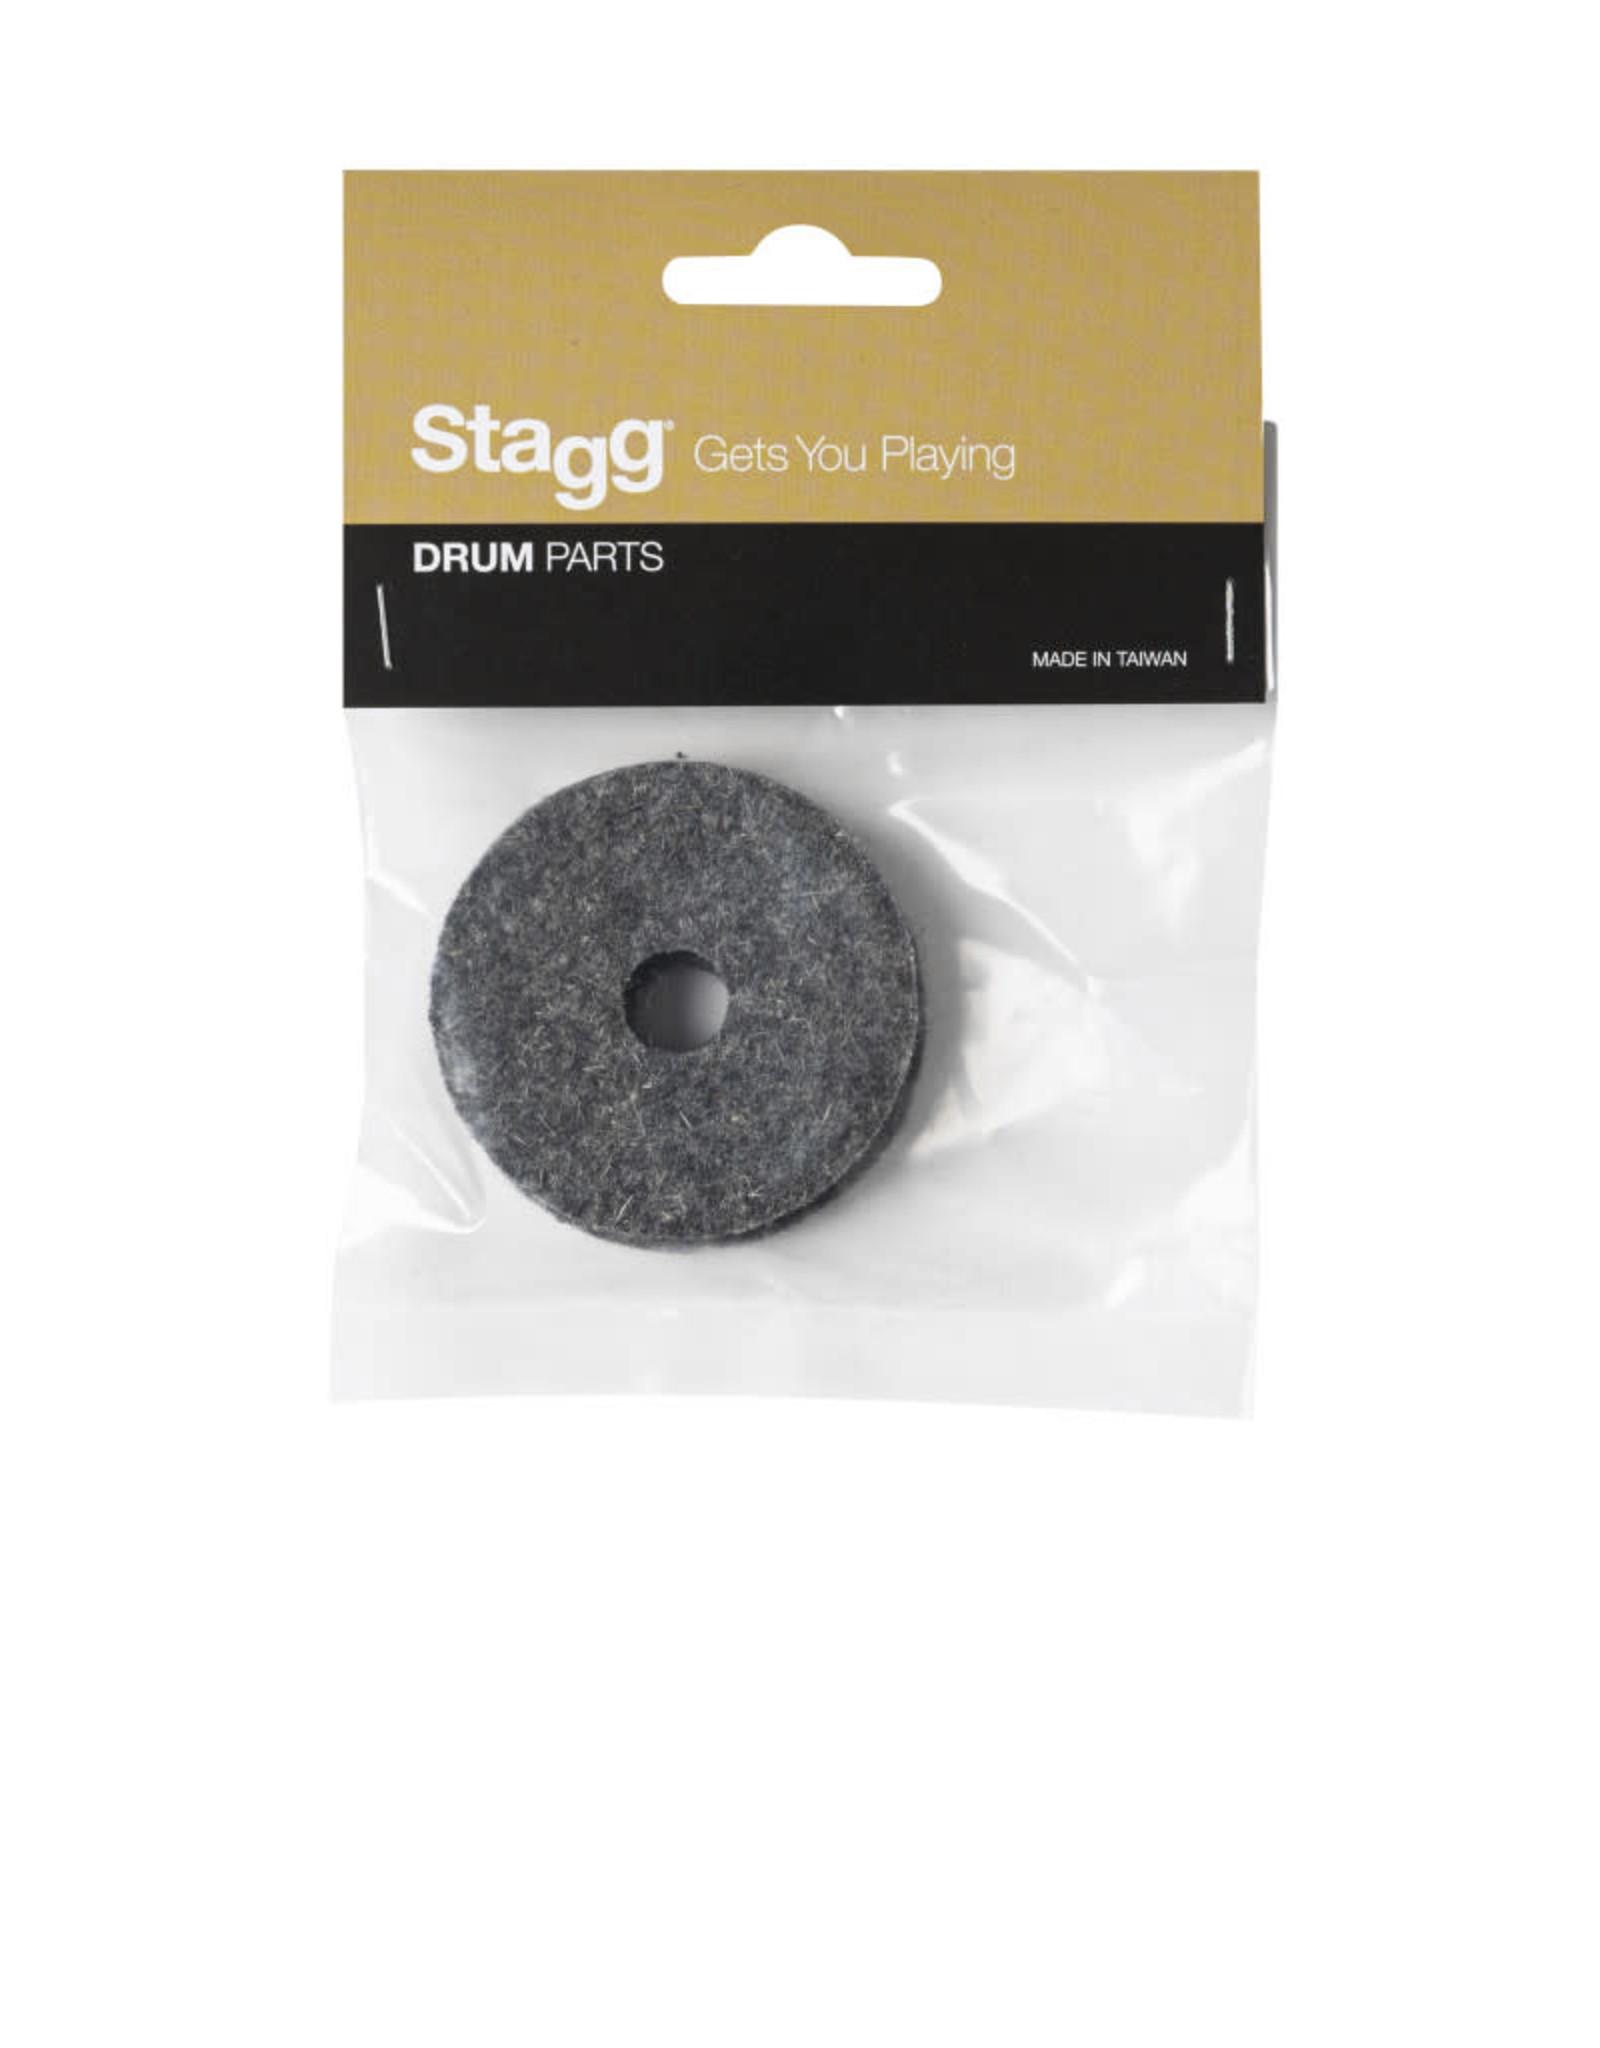 Stagg Stagg Hi-Hat Seat Felt Washer 2 pc.